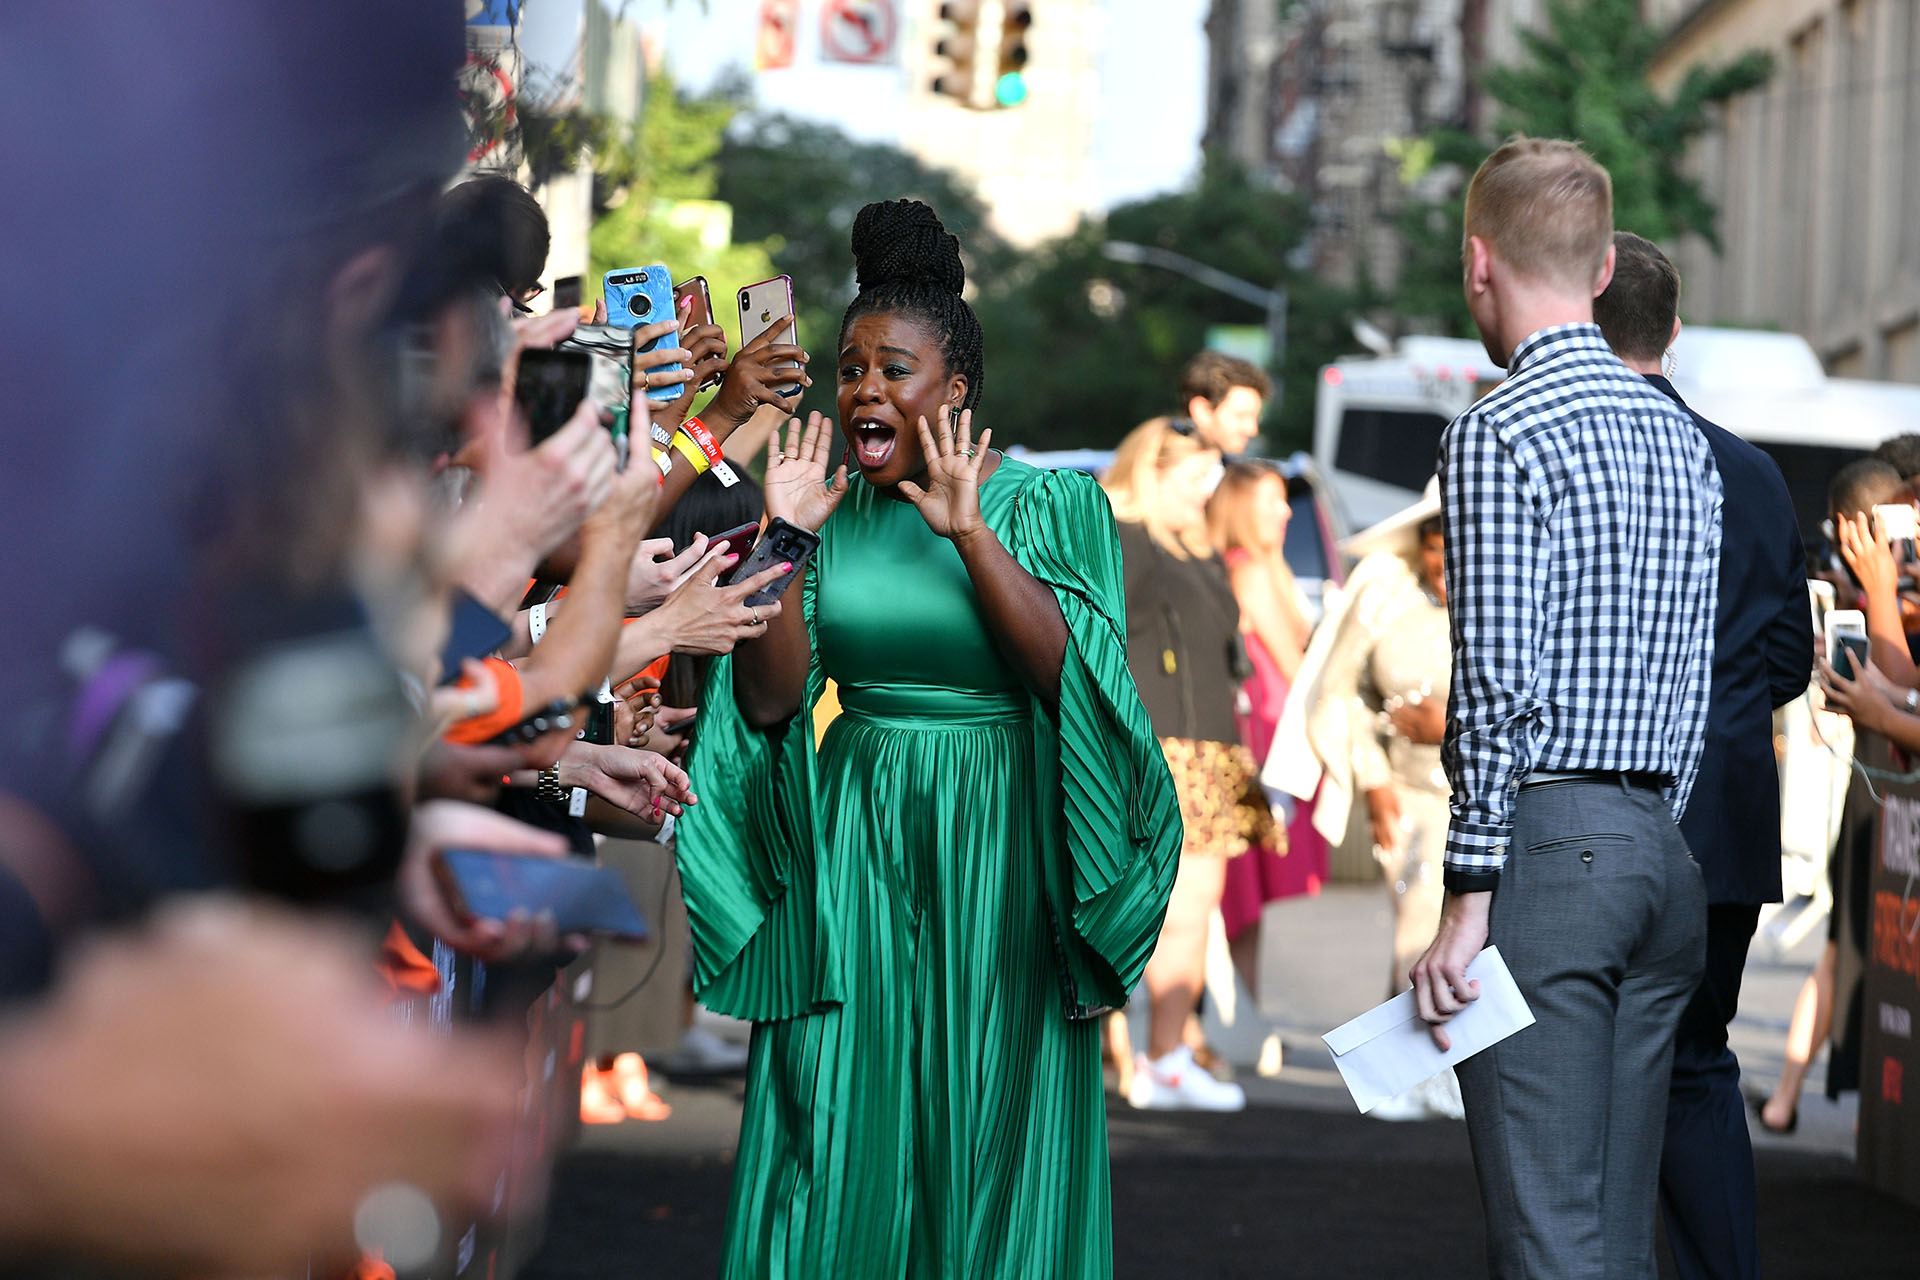 Uzo Aduba vistió un mono drapeado en verde esmeralda